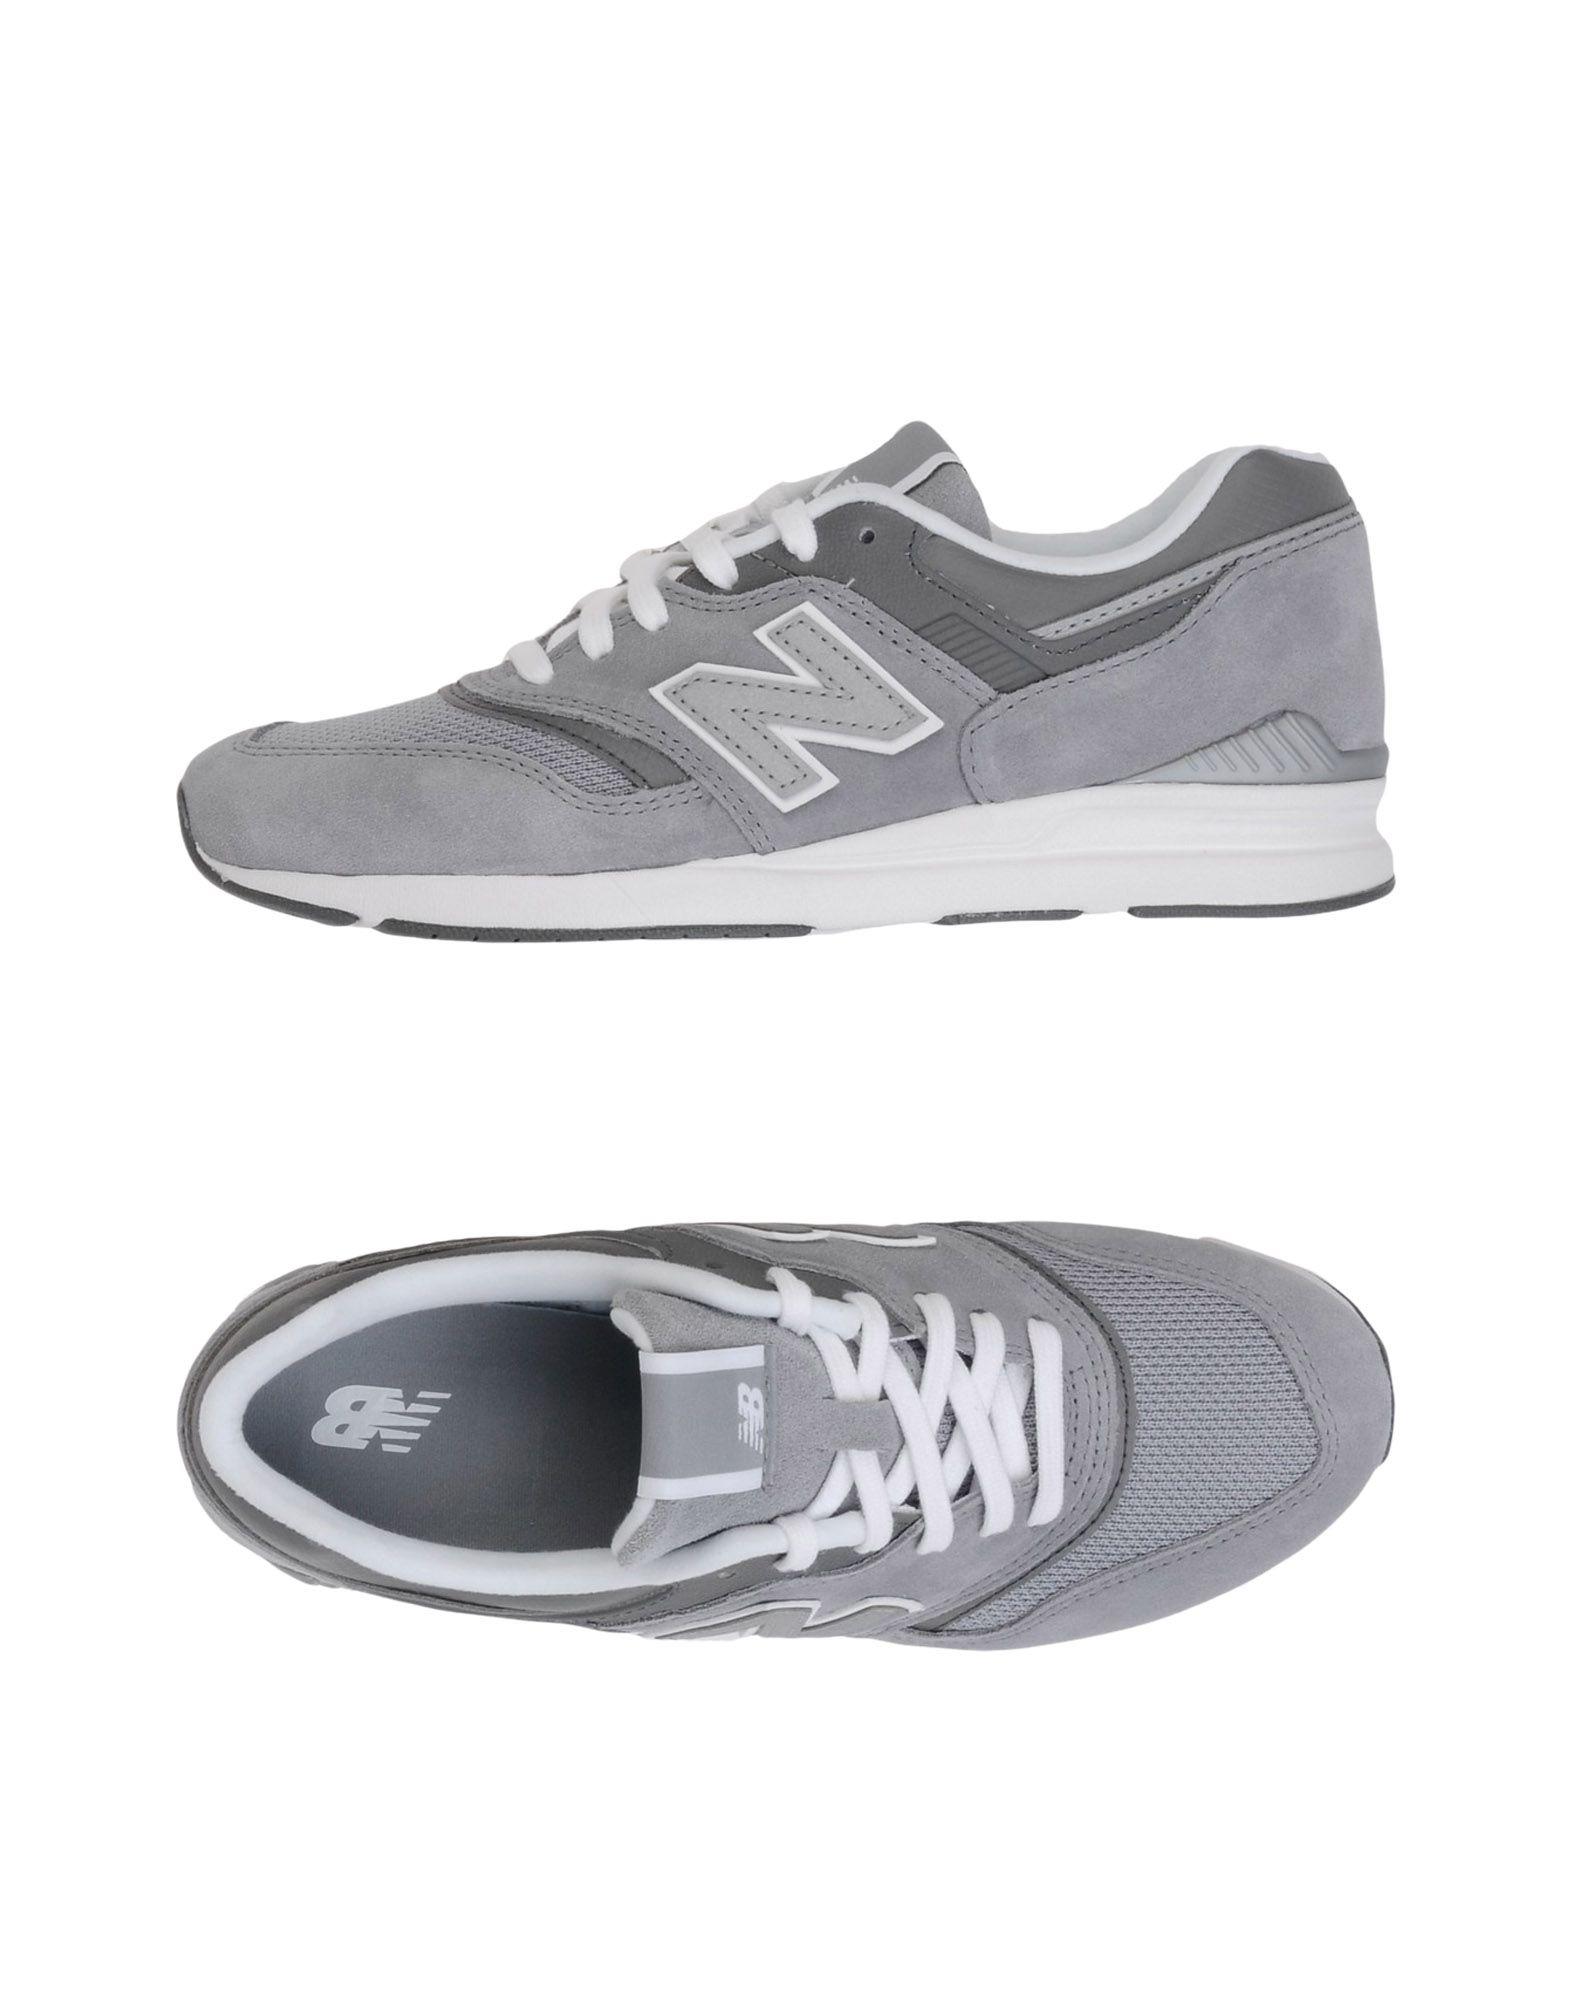 Zapatillas New Balance 697 Suede Balance - Mujer - Zapatillas New Balance Suede  Gris 4a9833